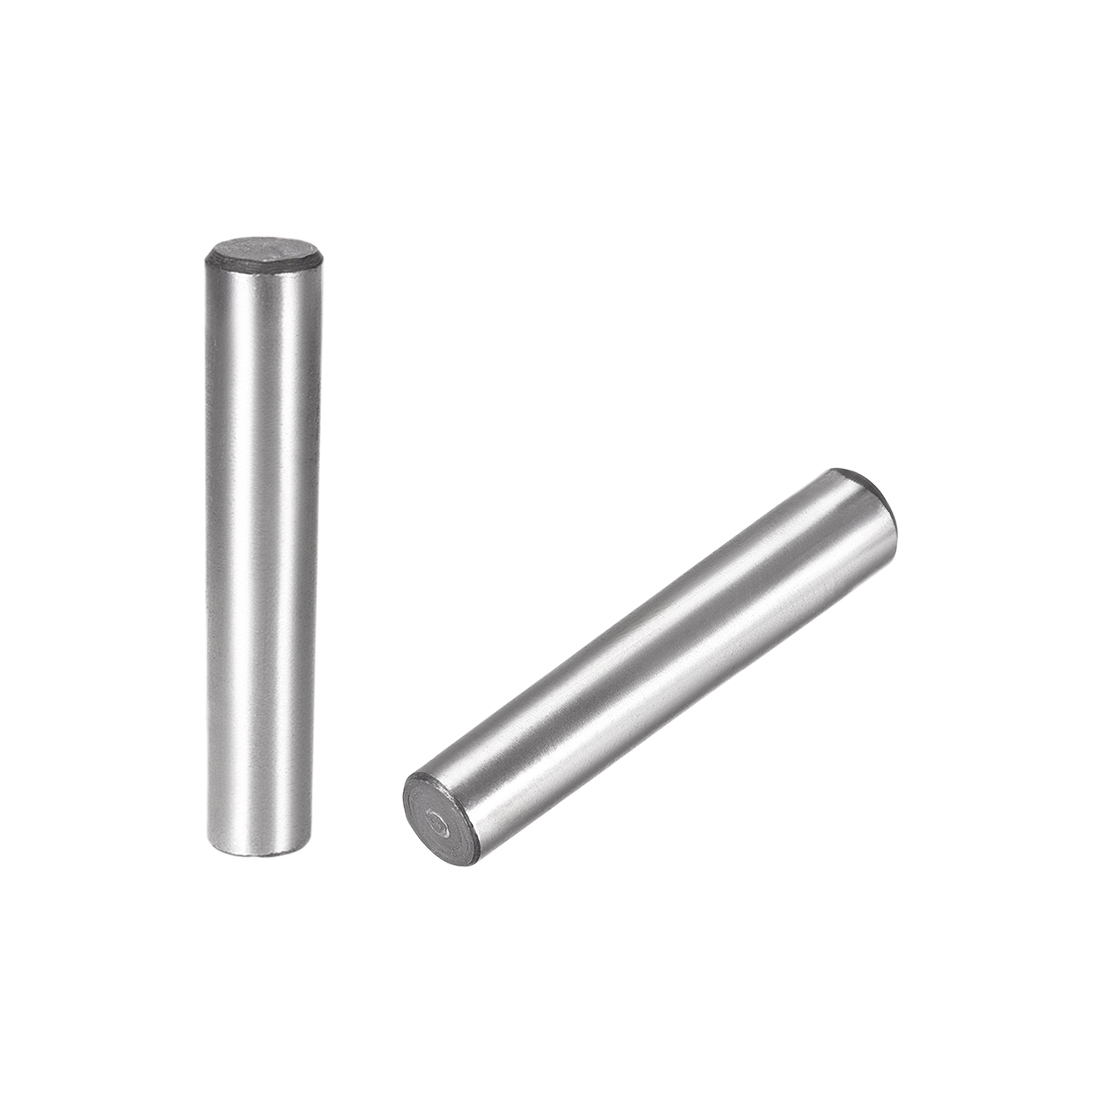 Carbon Steel GB117 70mm Length 12mm x 13.4mm Small End Diameter 1:50 Taper Pin